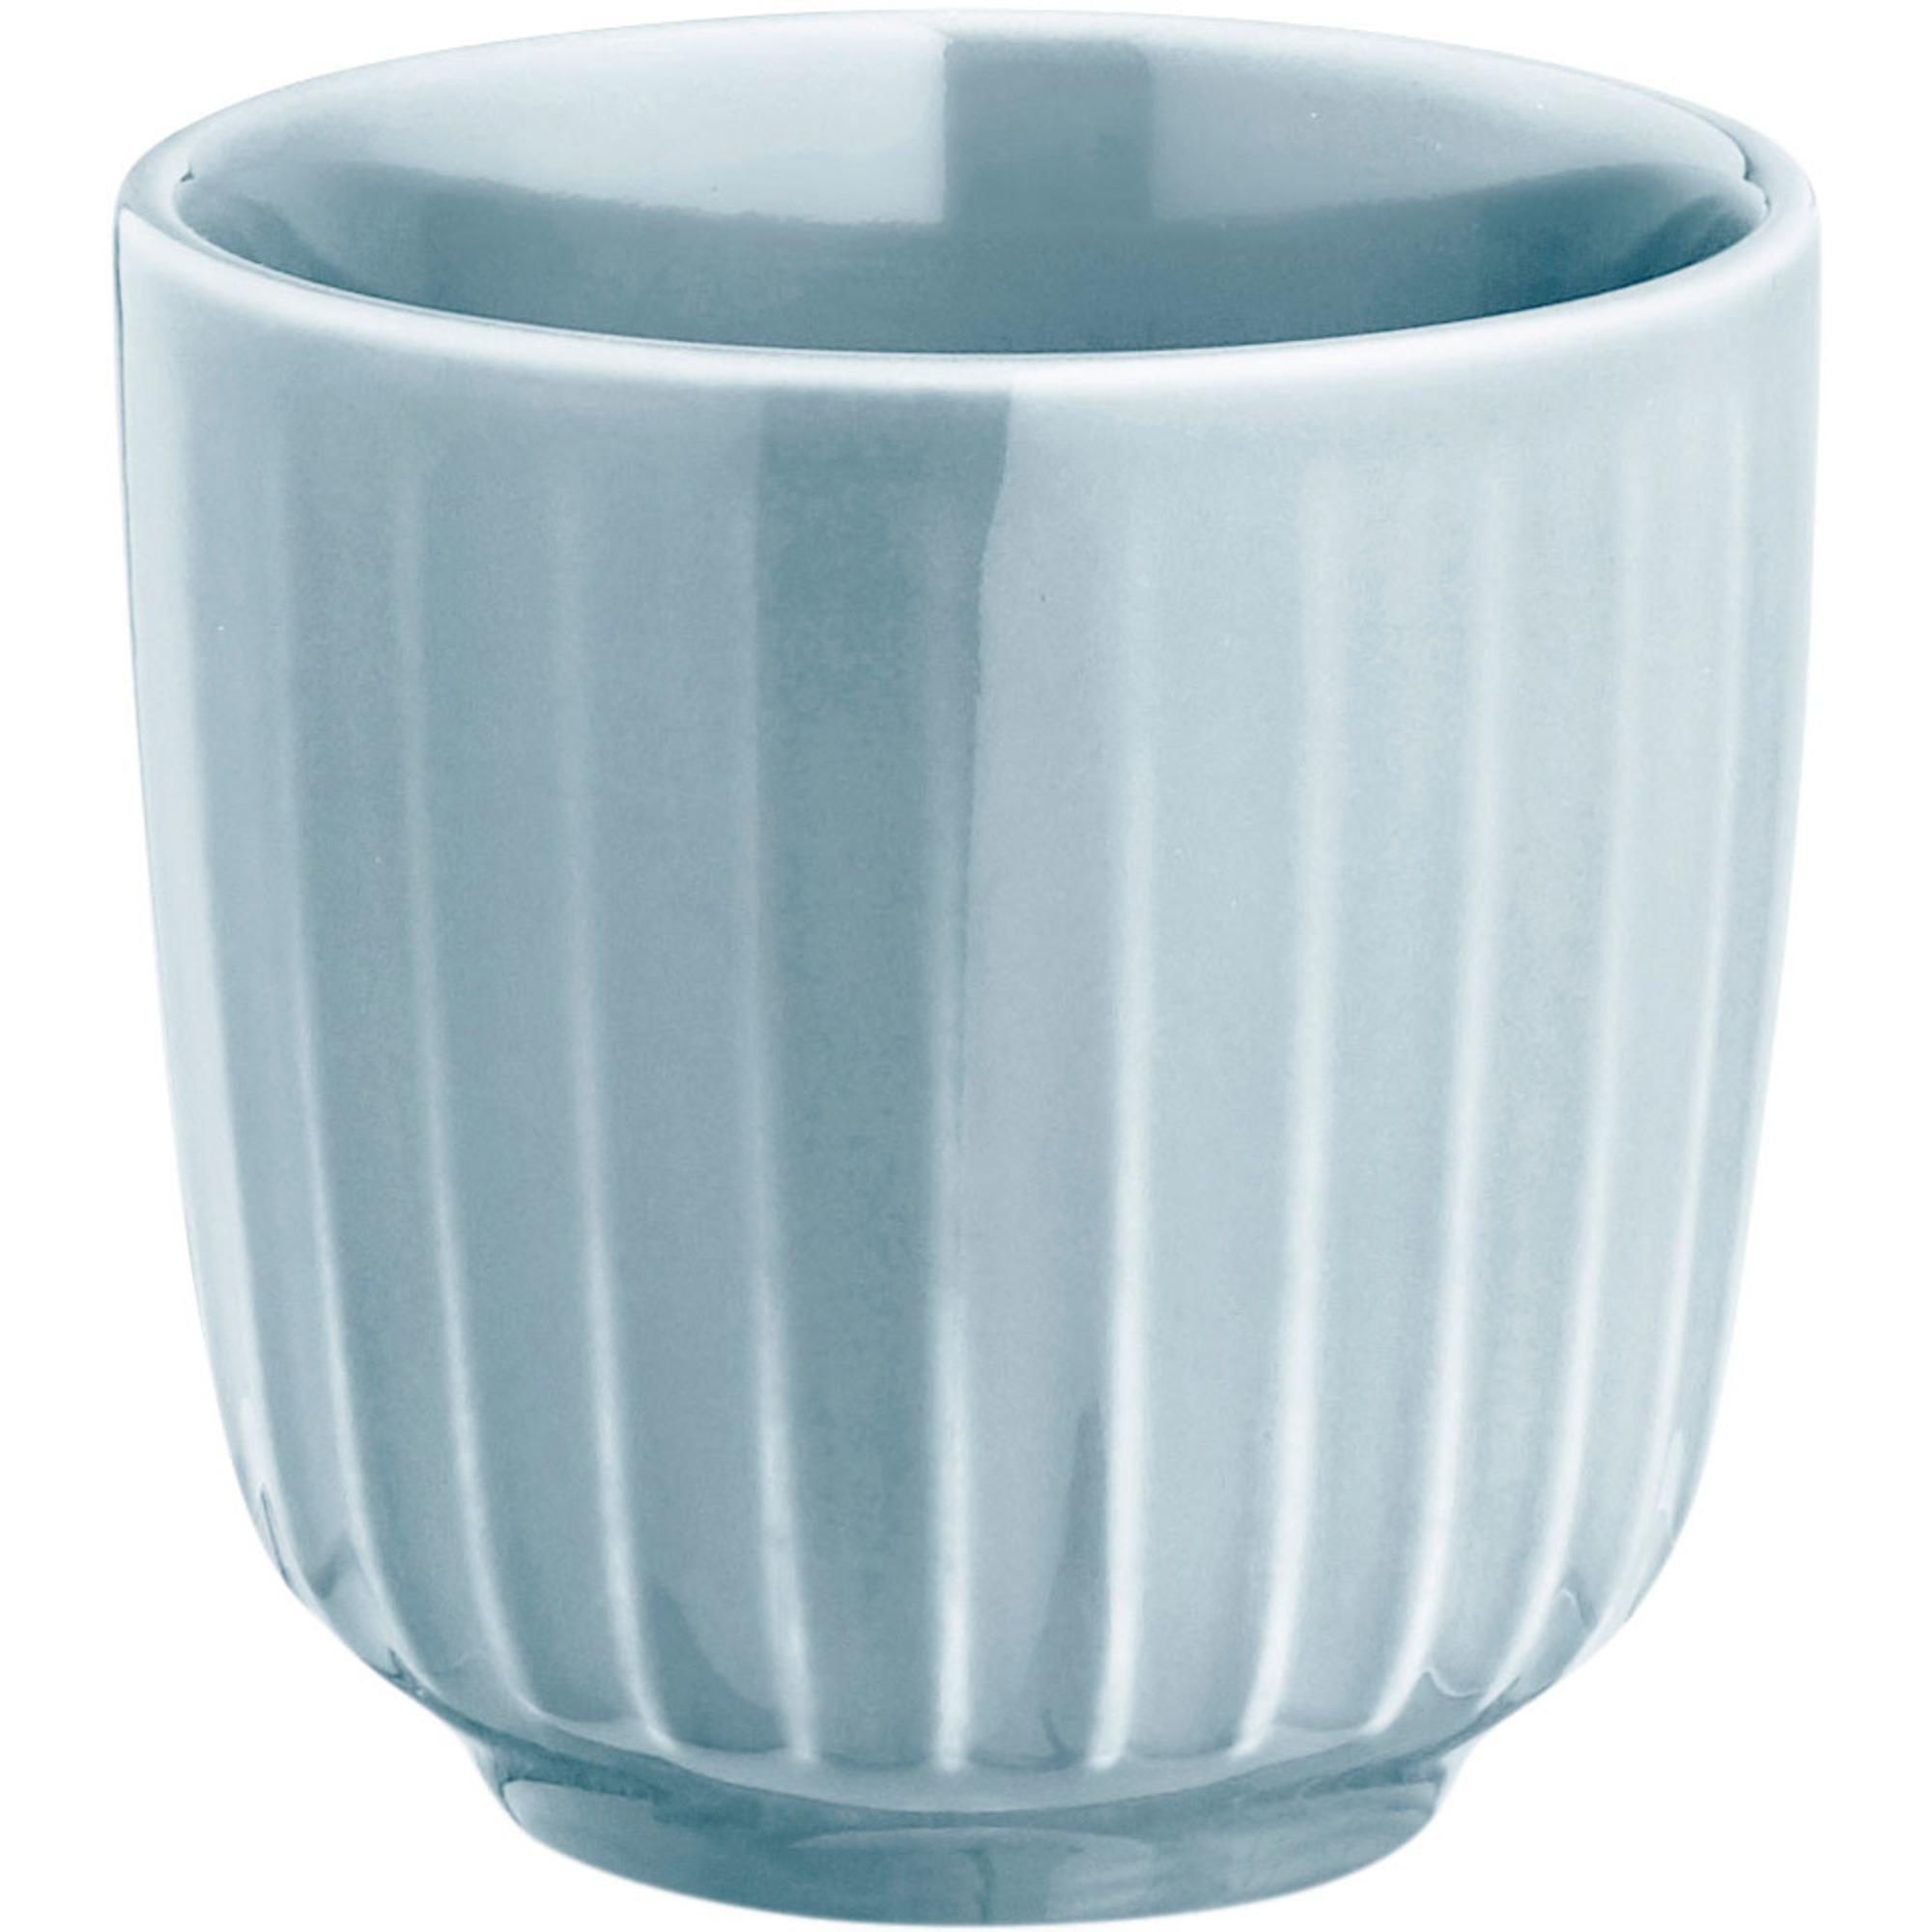 Kähler Hammersøi Espressokopp 10 cl Blå